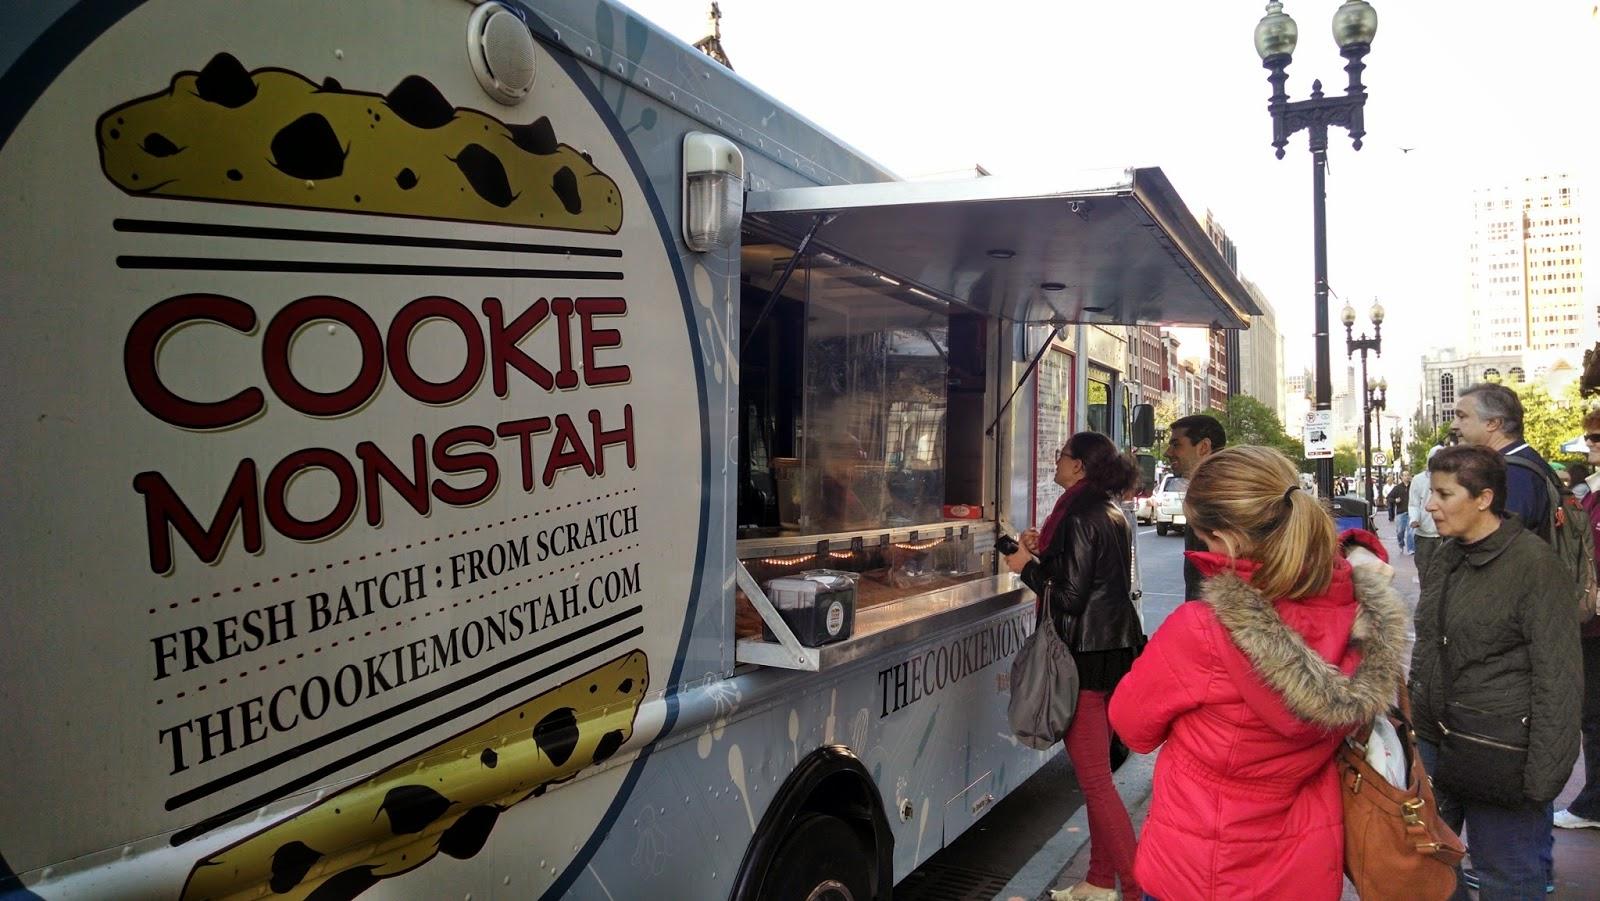 cookie monstah boston blog review